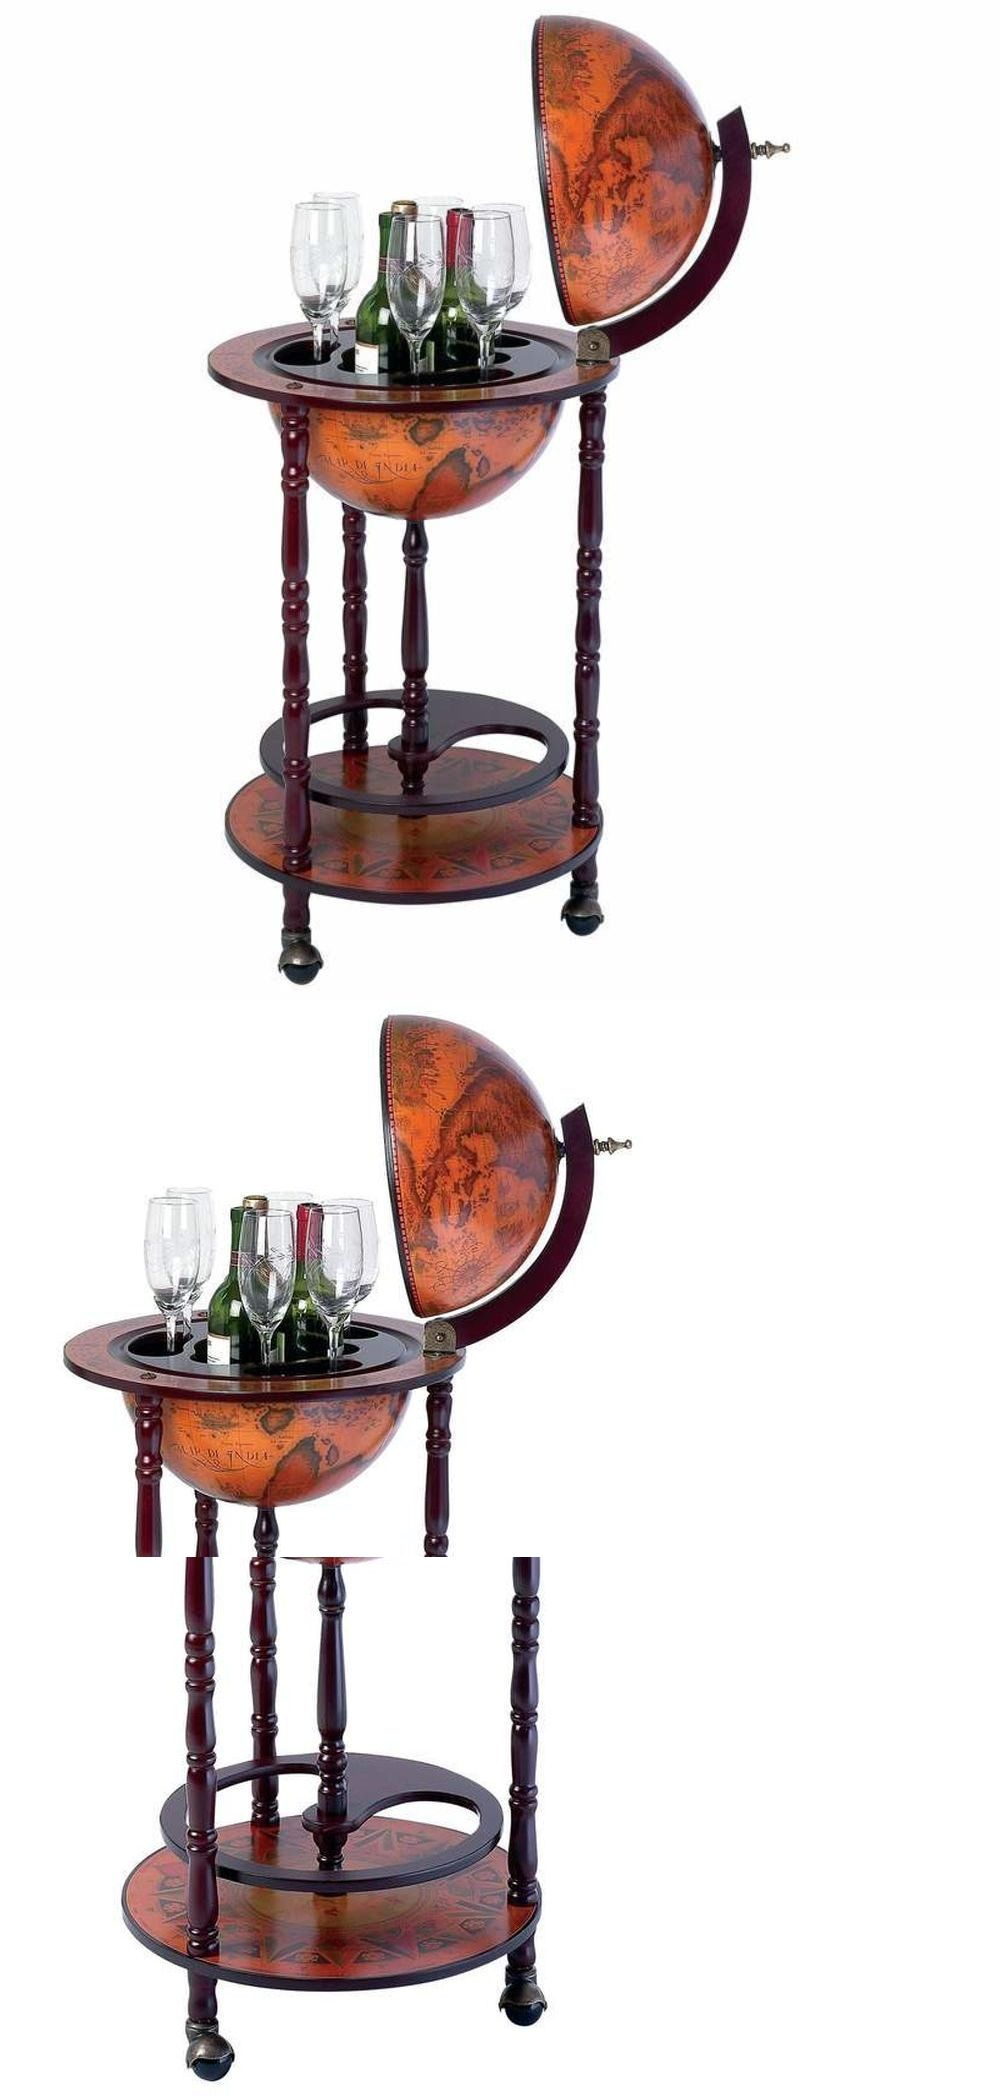 Home Pubs And Bars 115713 Wine Globe Bar Furniture Italian Old World Replica Liquor Storage